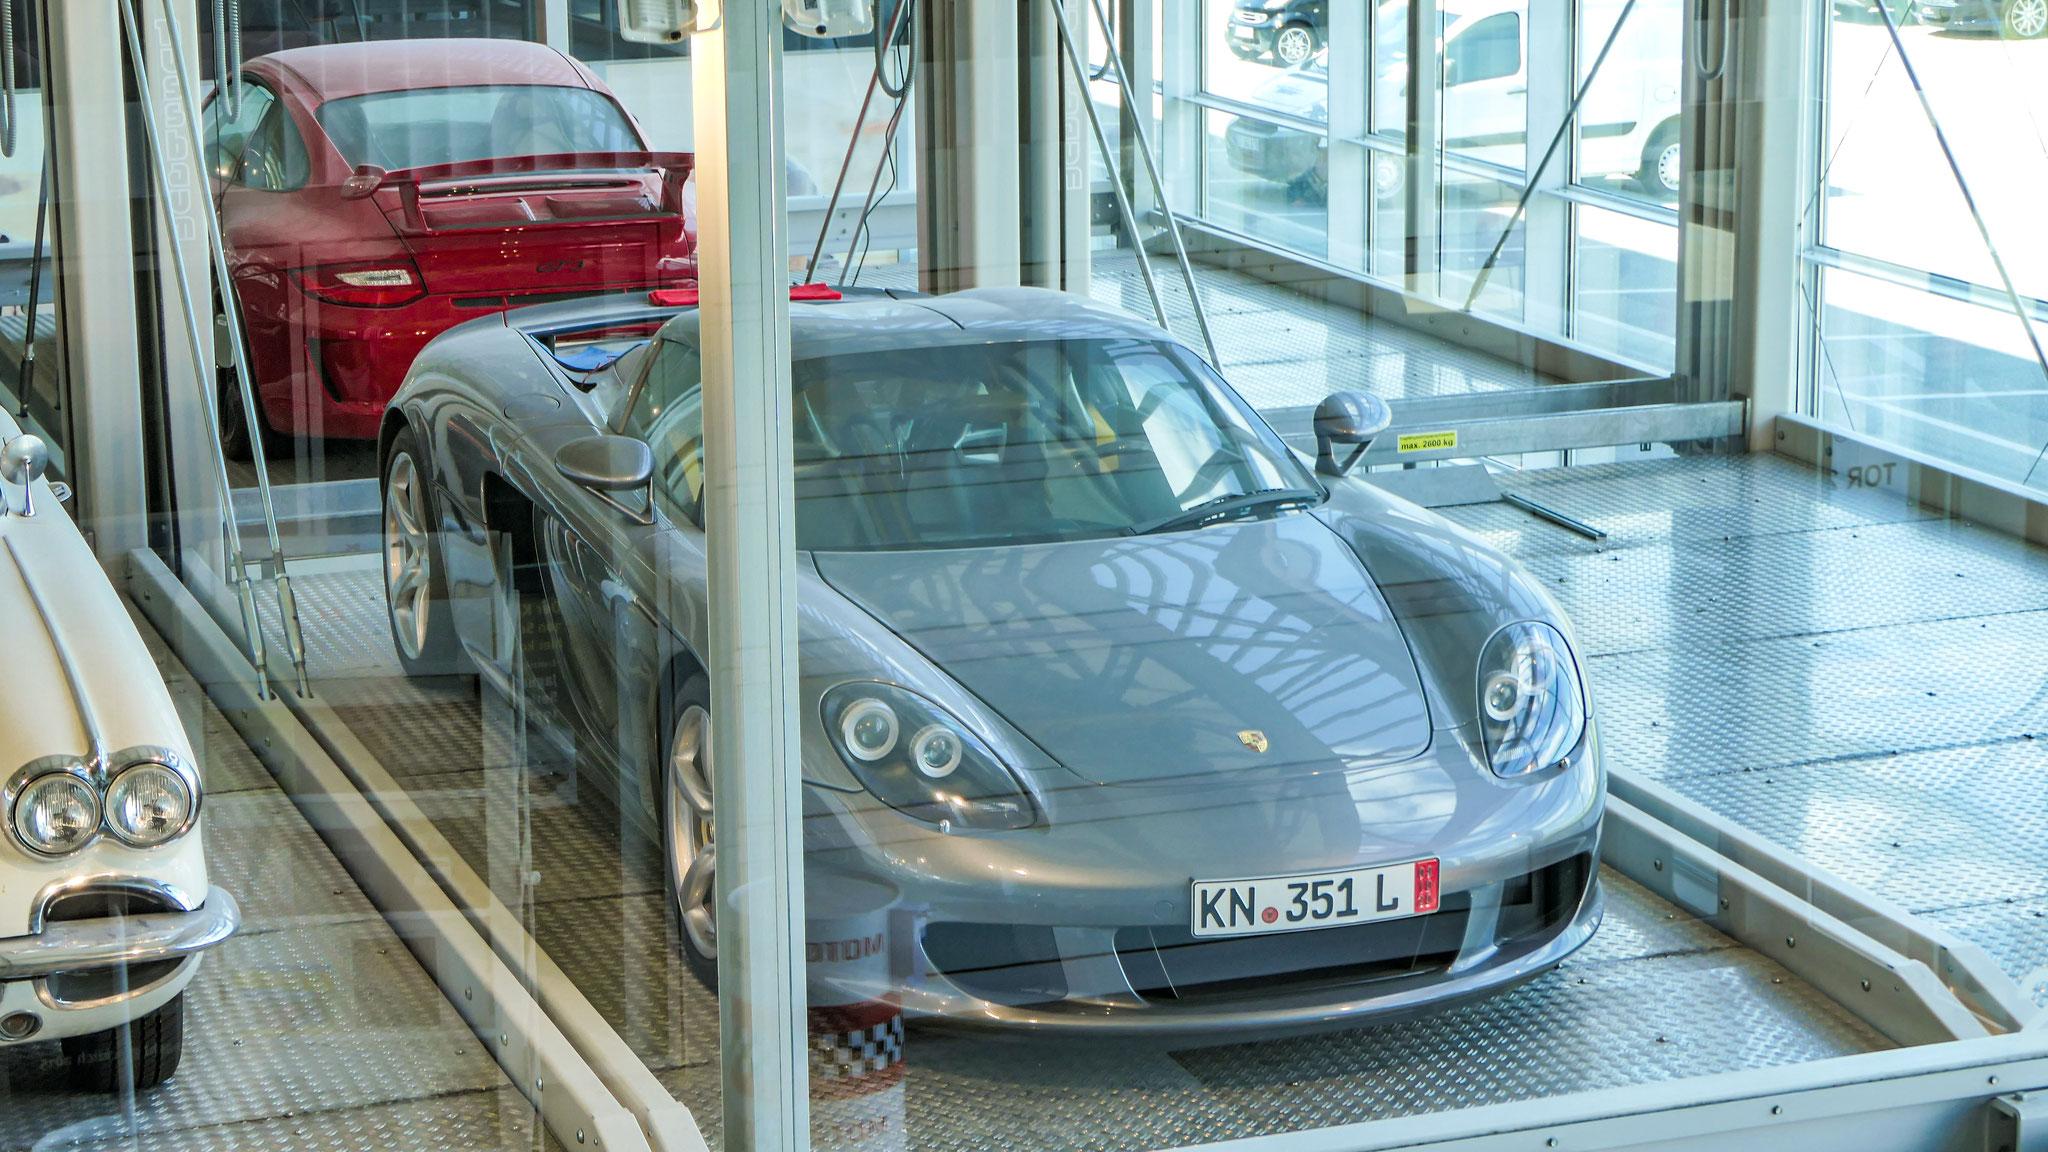 Porsche Carrera GT - KN-351-L